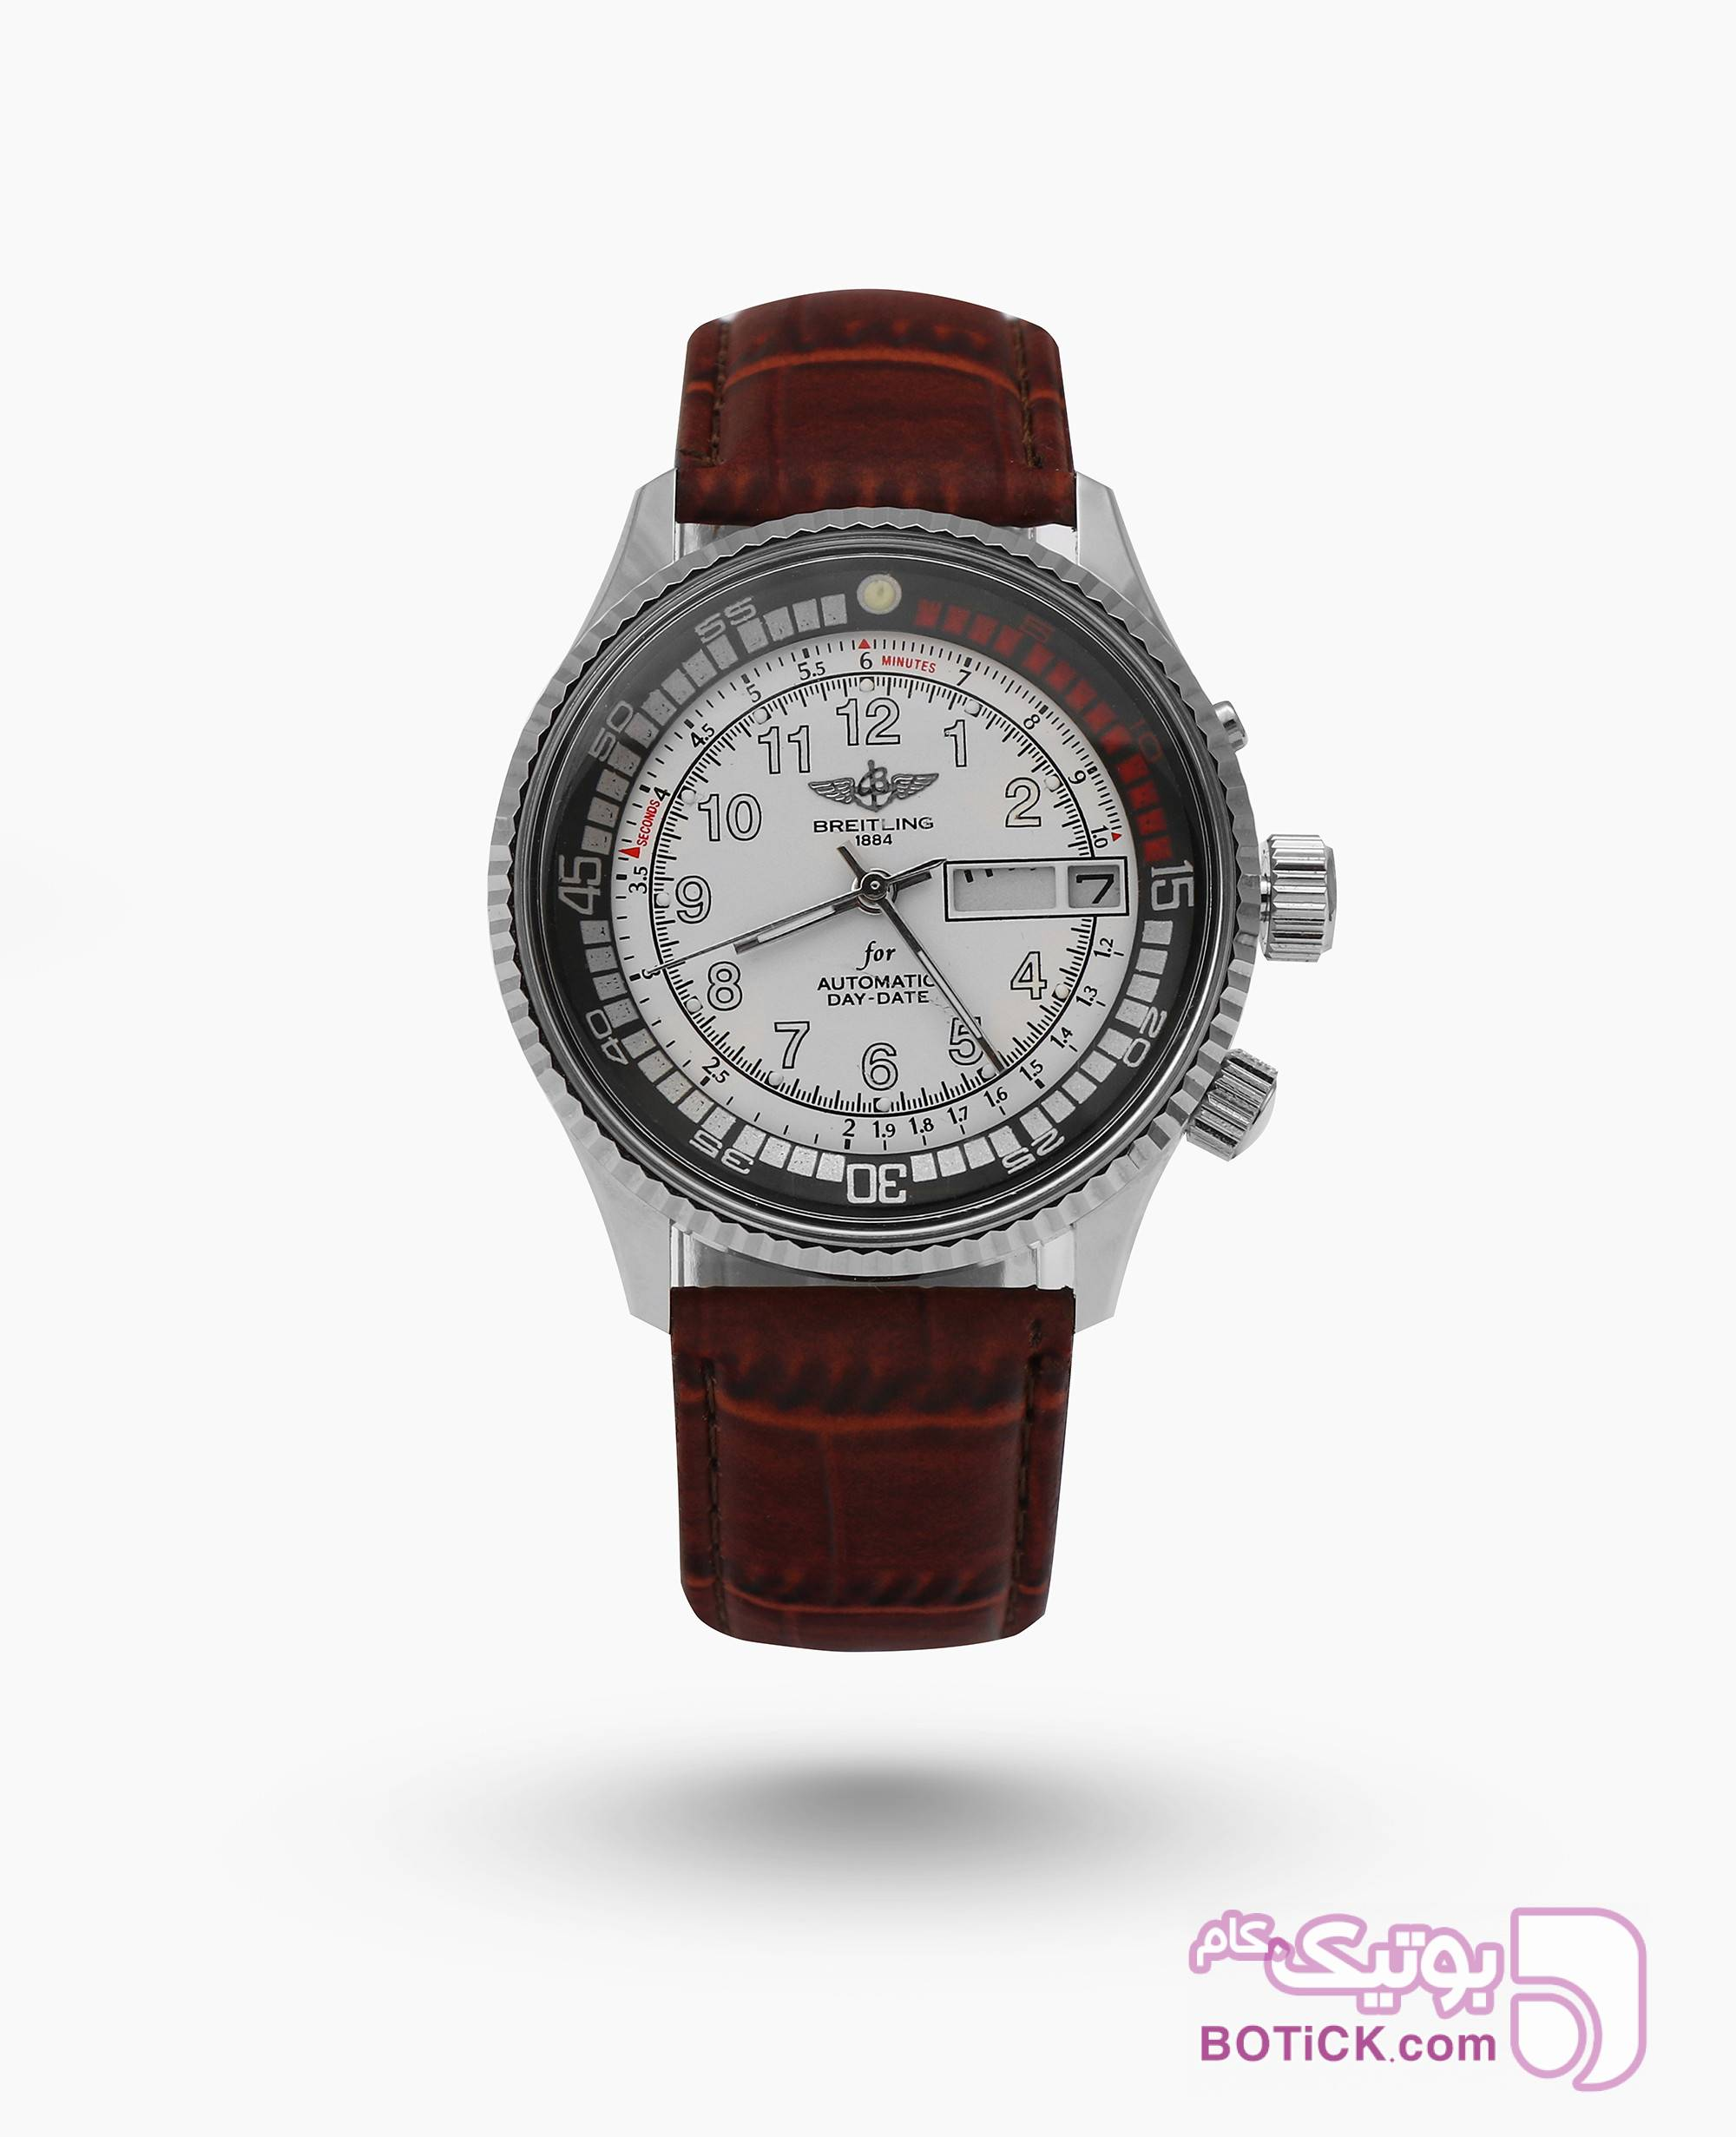 ساعت مچی اتوماتیک Breitling کد 1884 مشکی ساعت